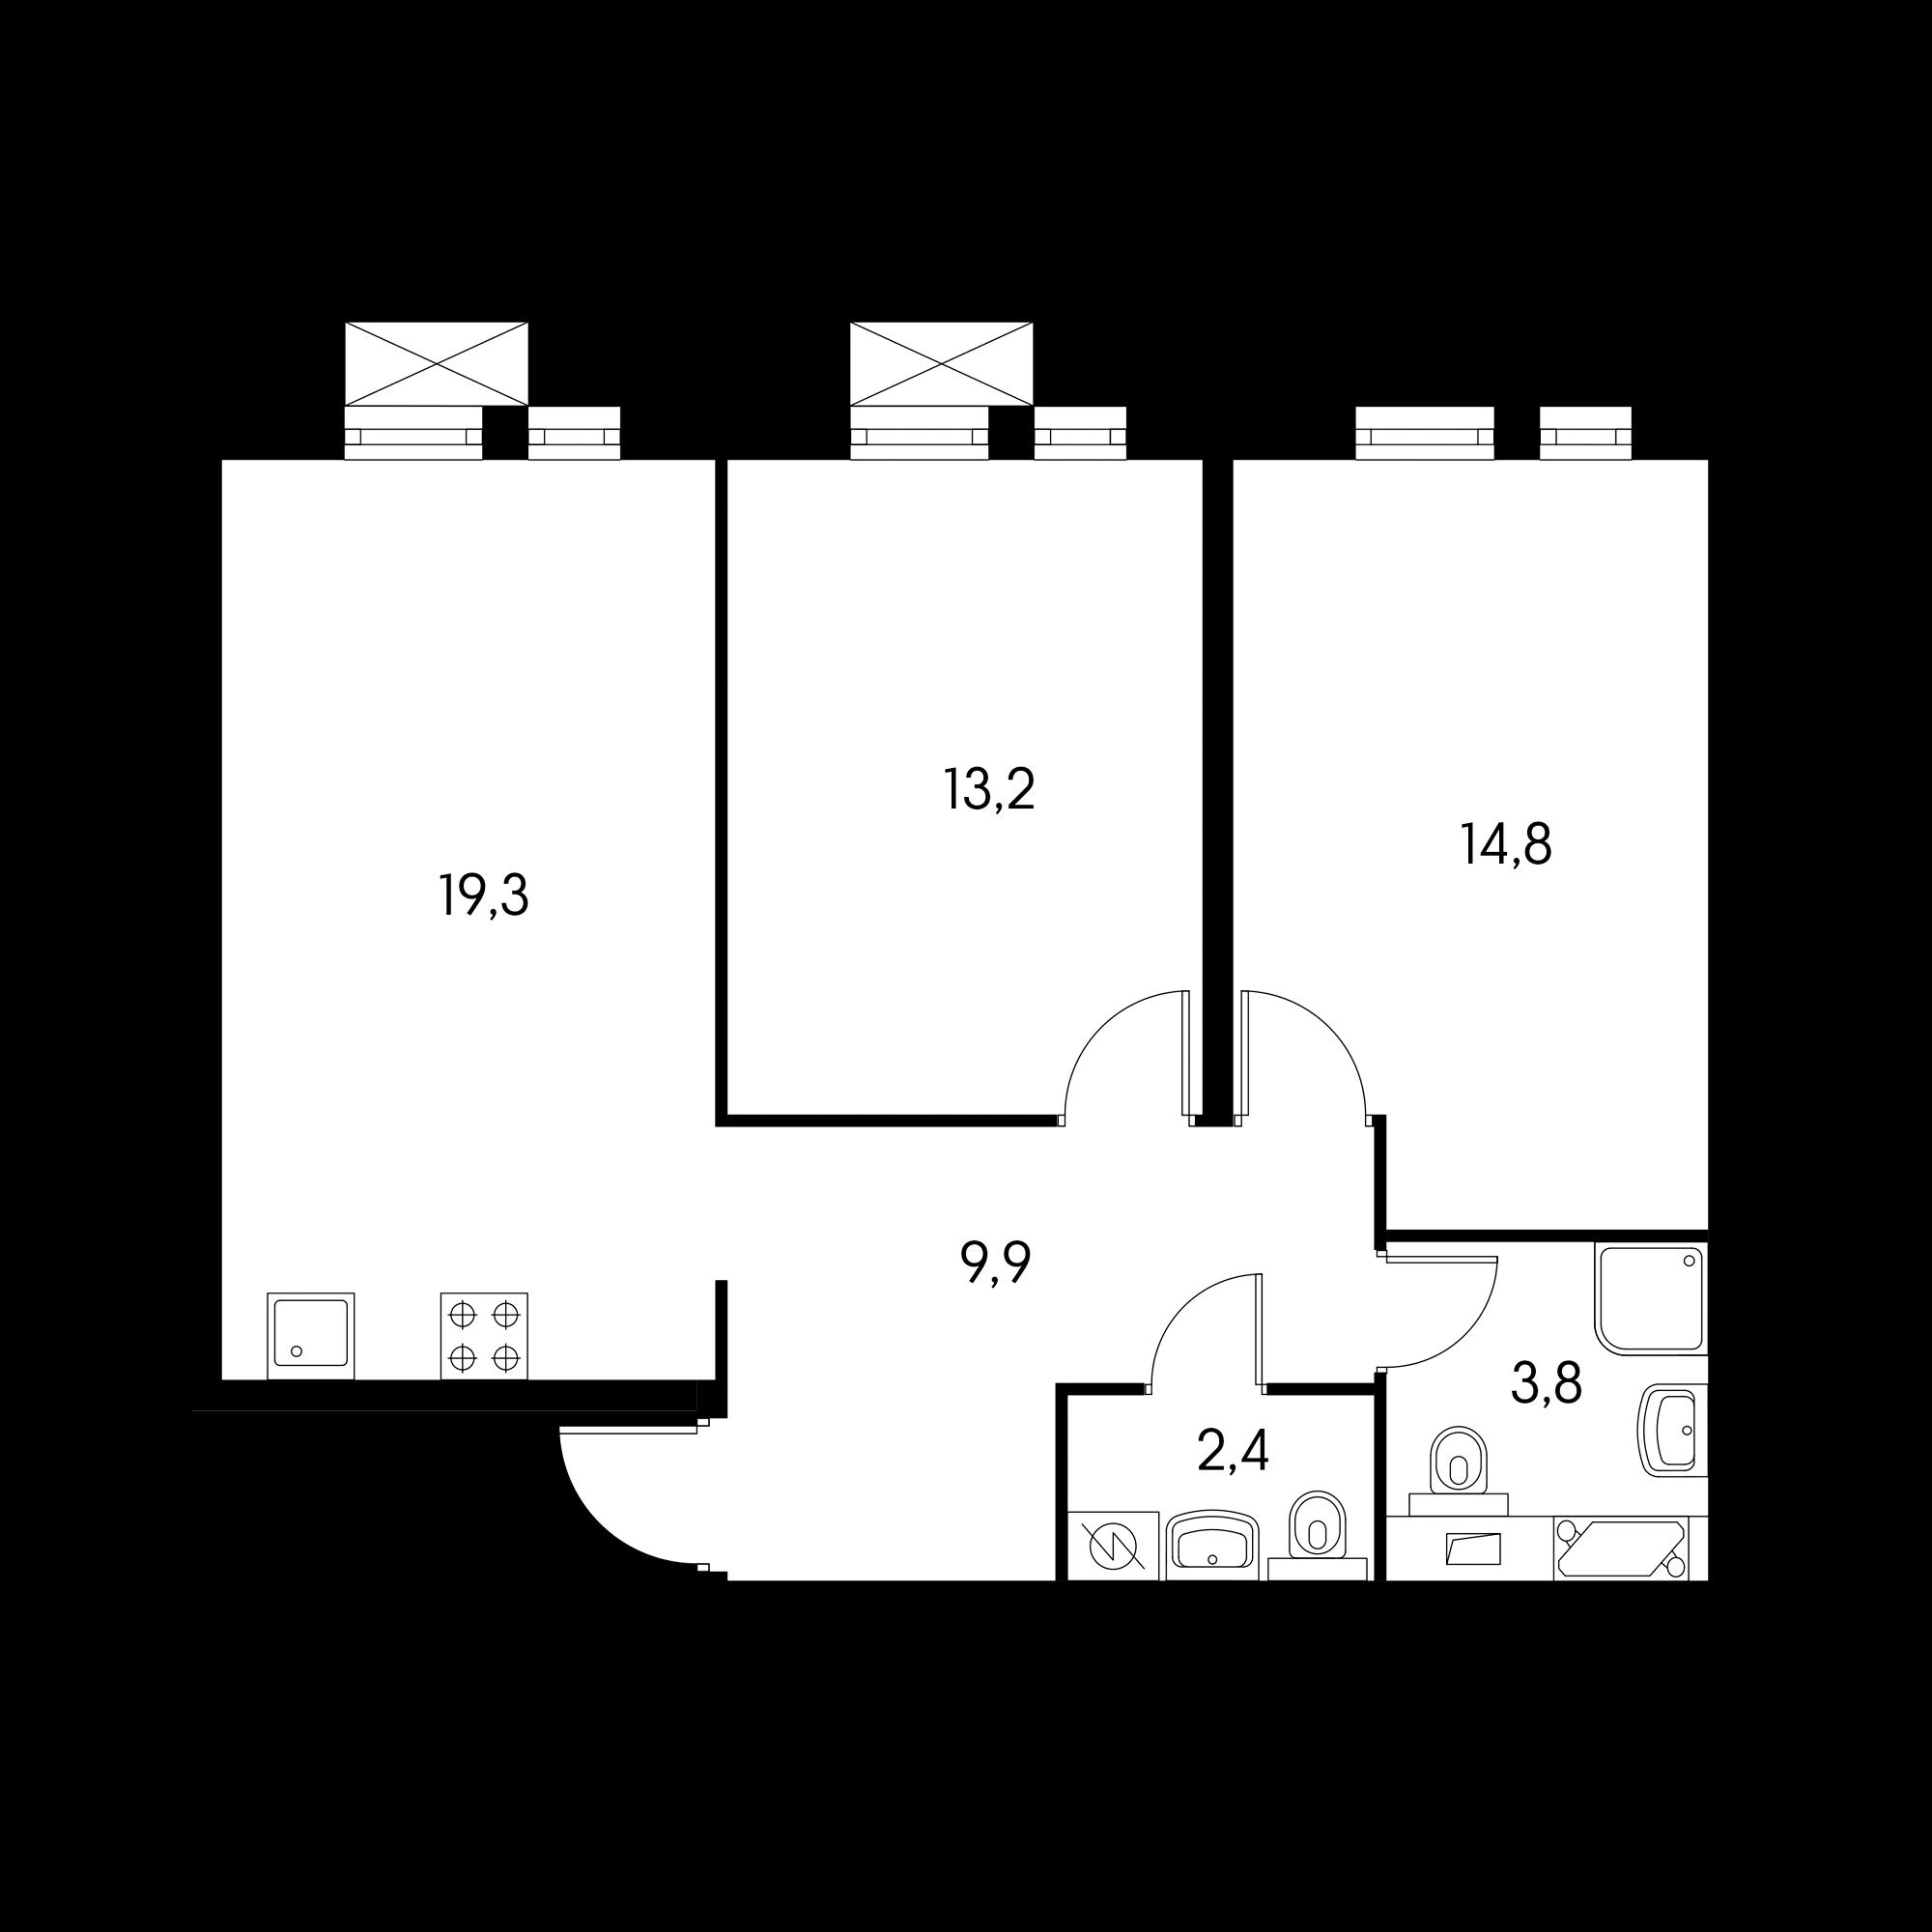 2-2_2(3)*